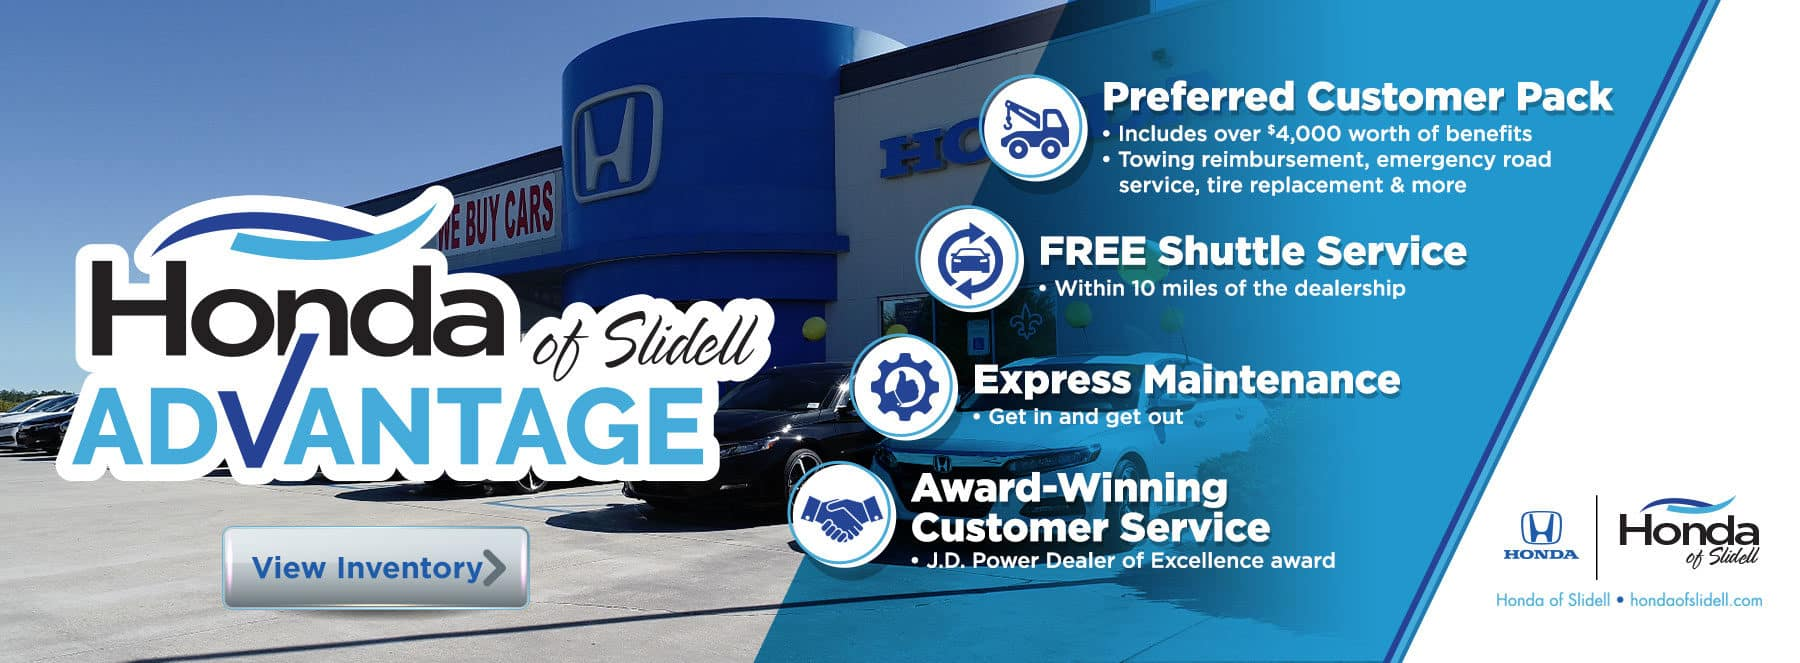 HondaSlidell_Advantage_Slide_1800x663_06-21